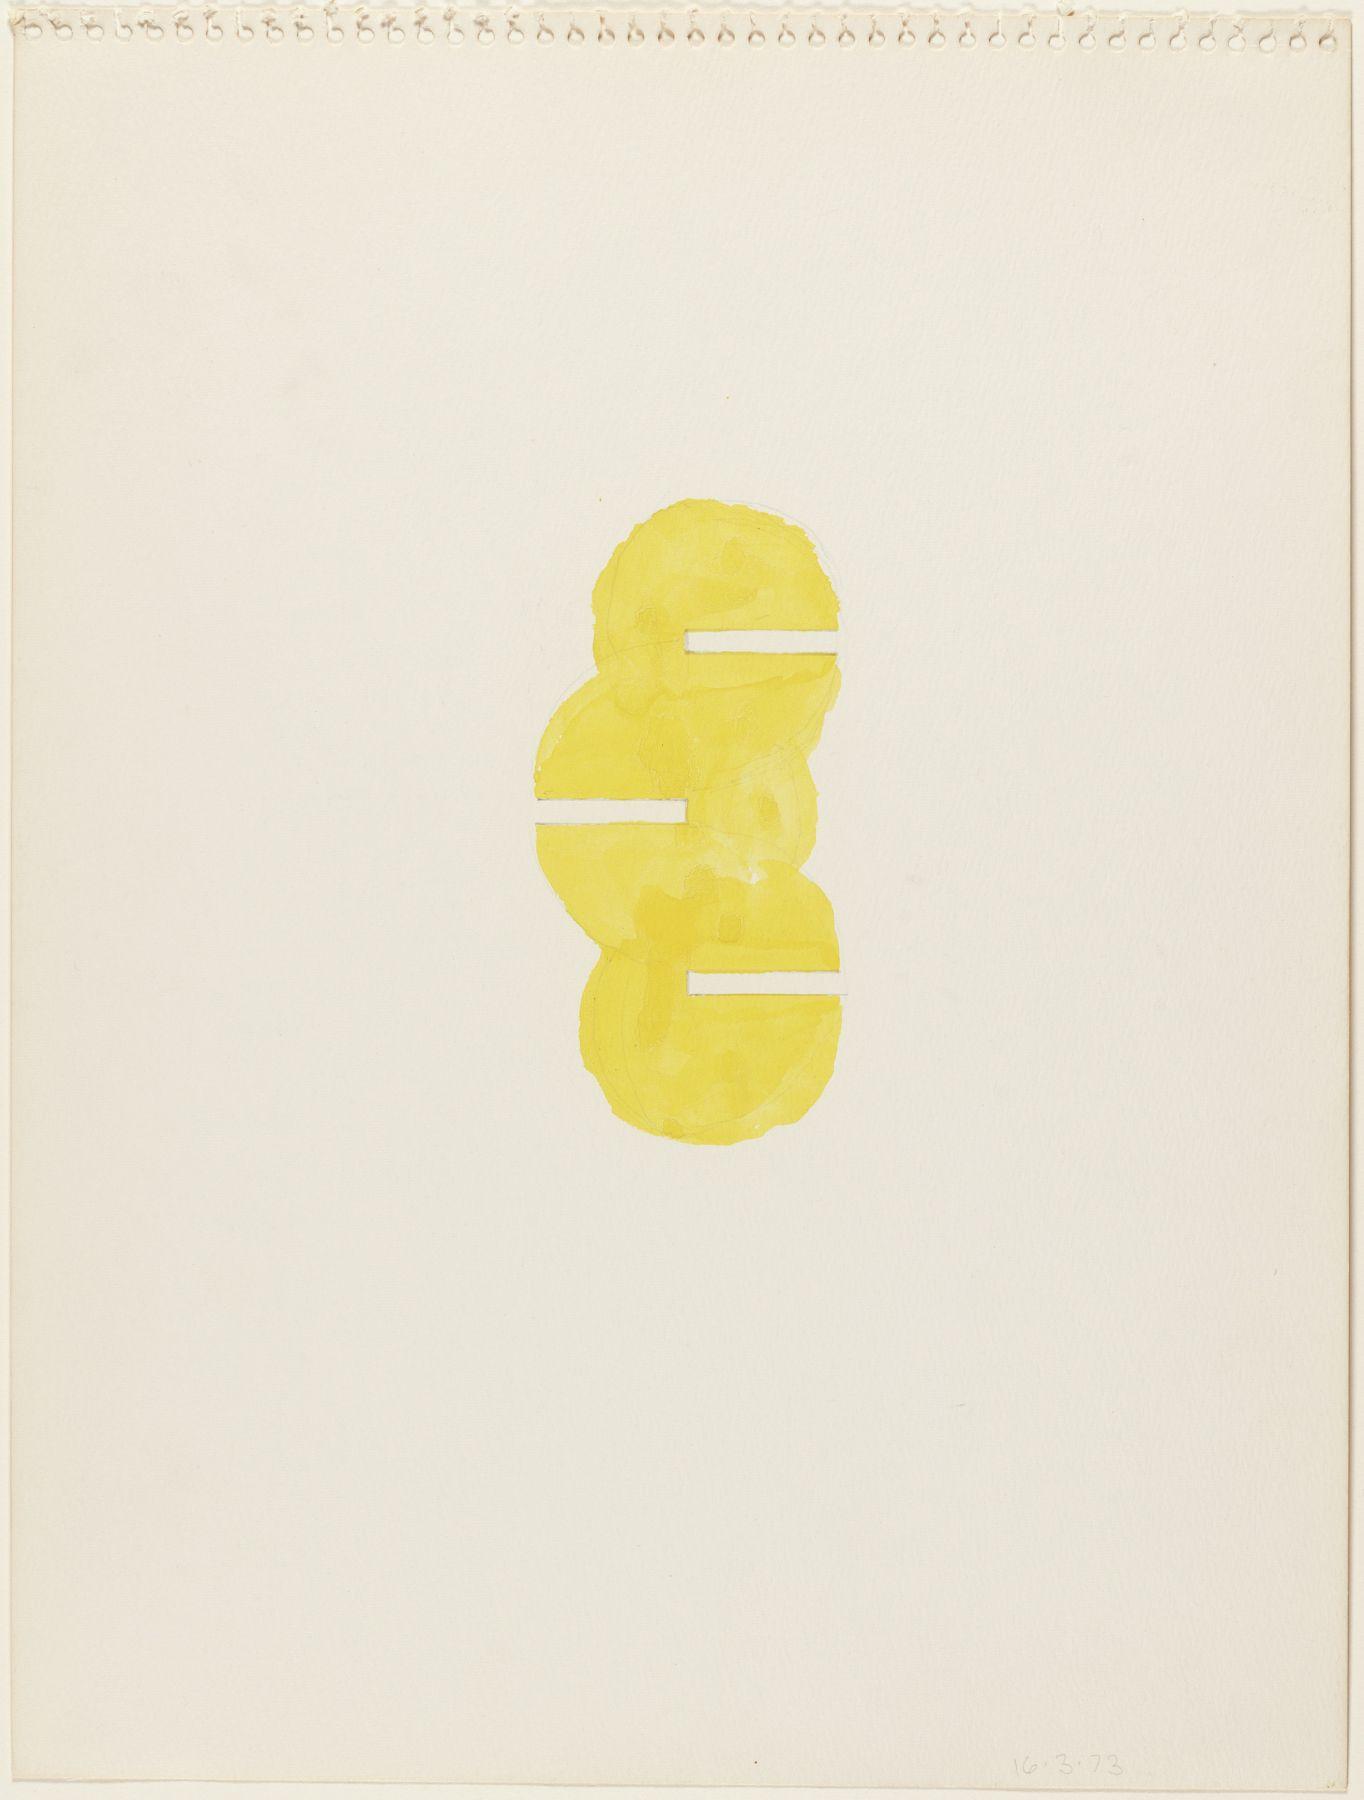 Richard Tuttle,One Way, 1967.